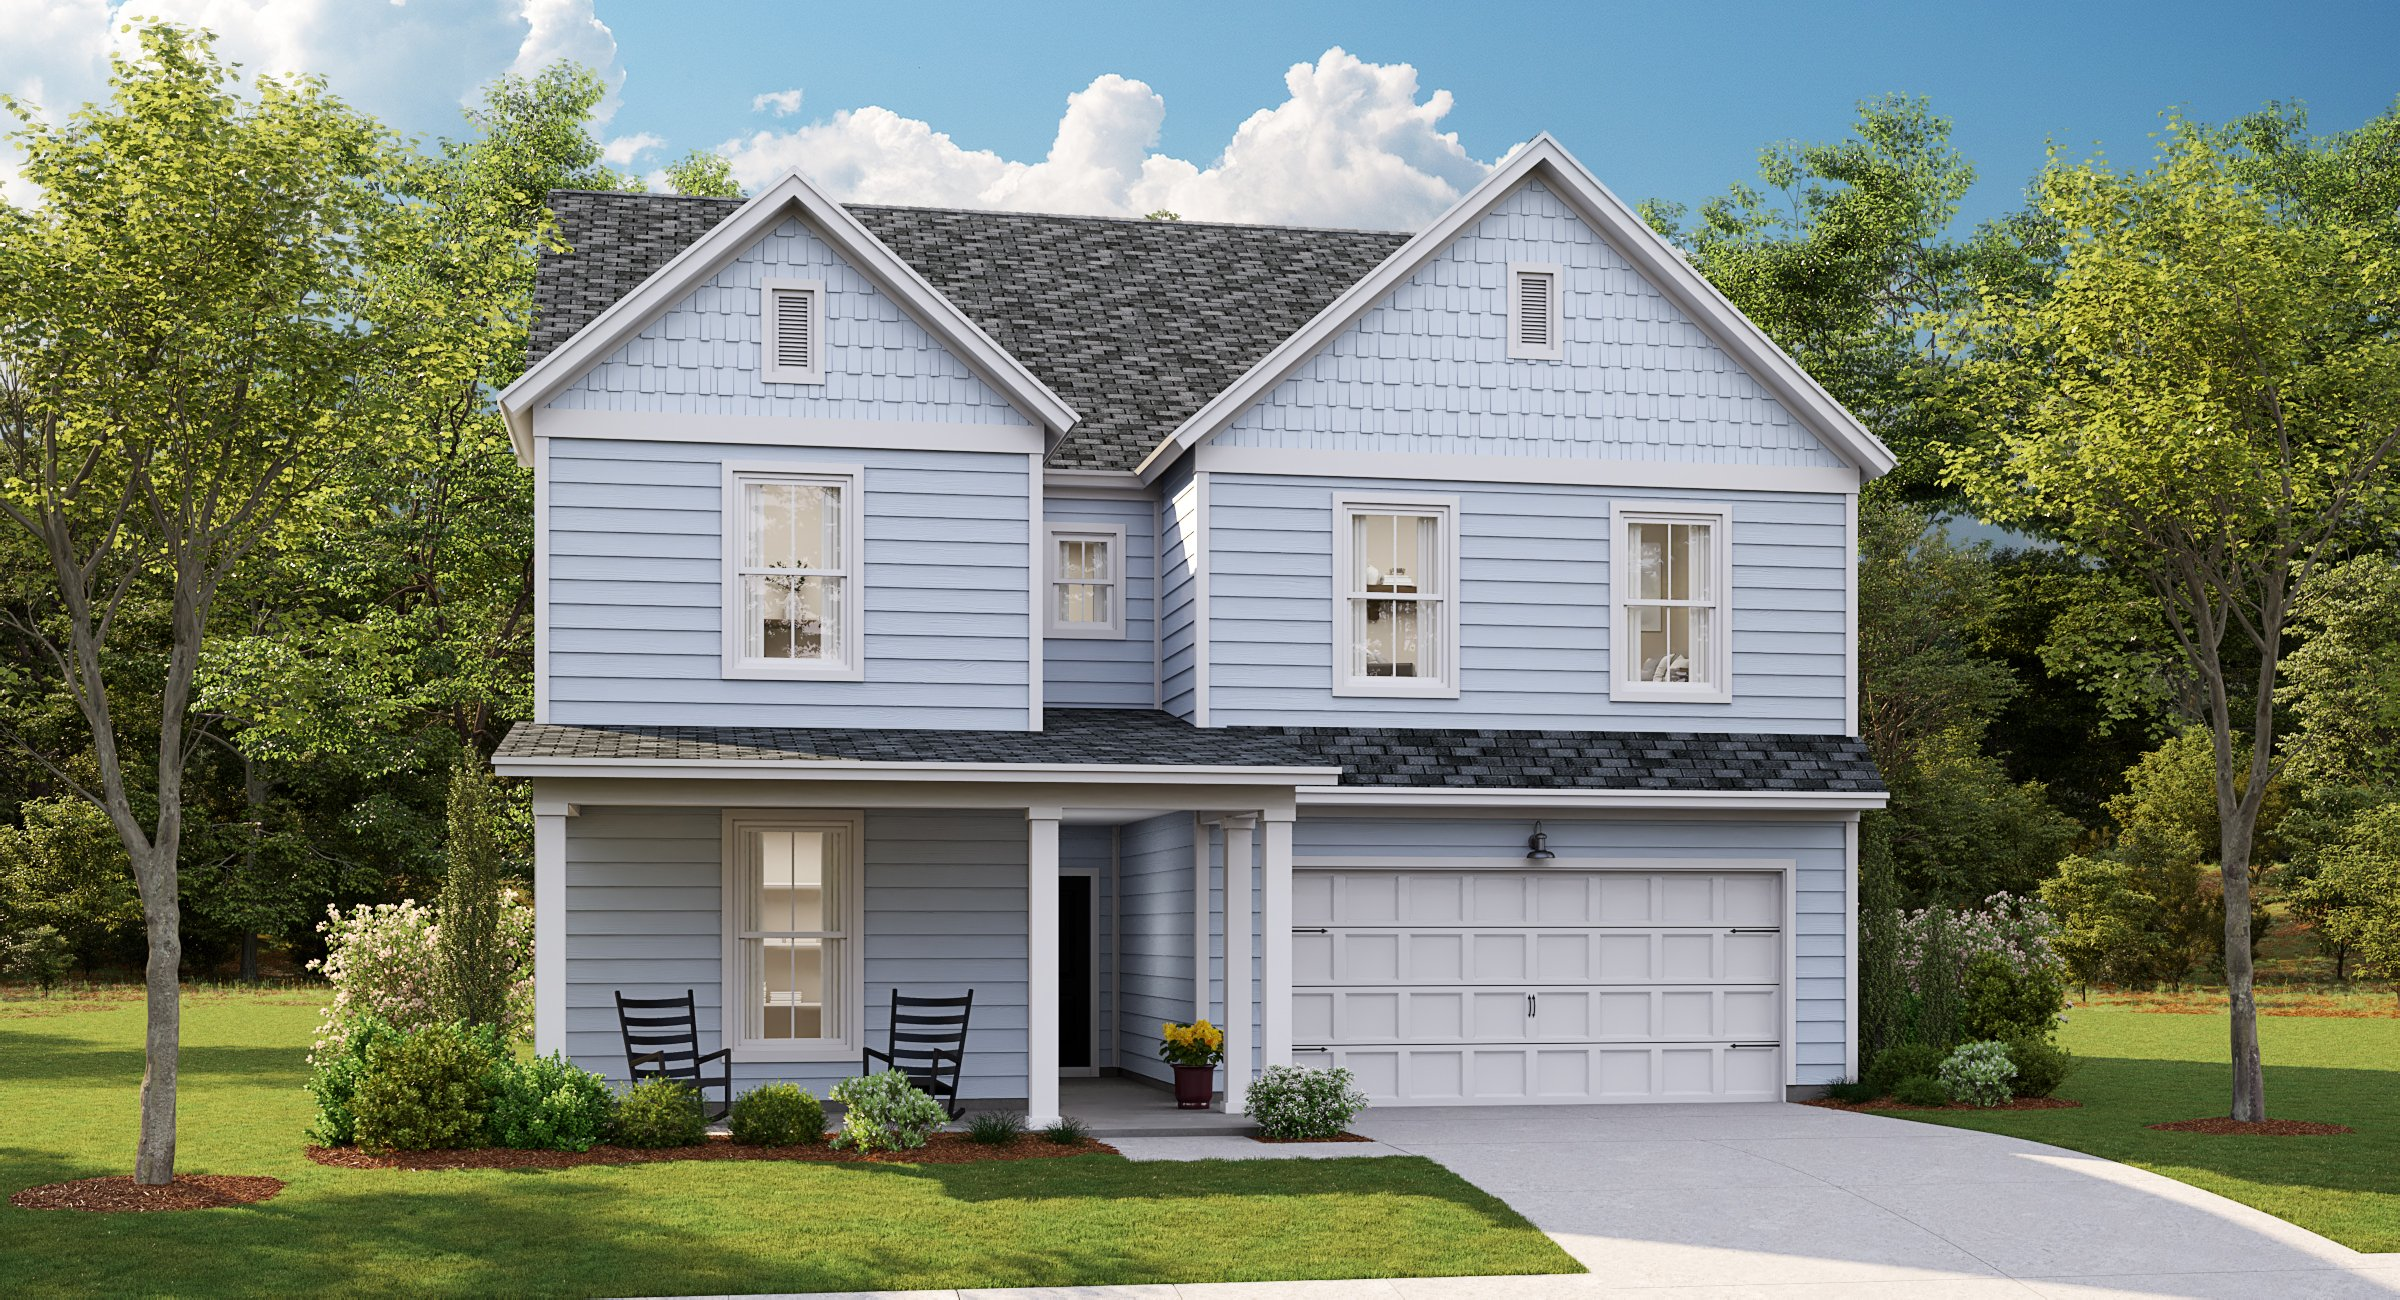 Taylor by Lennar, New Homes in South Carolina